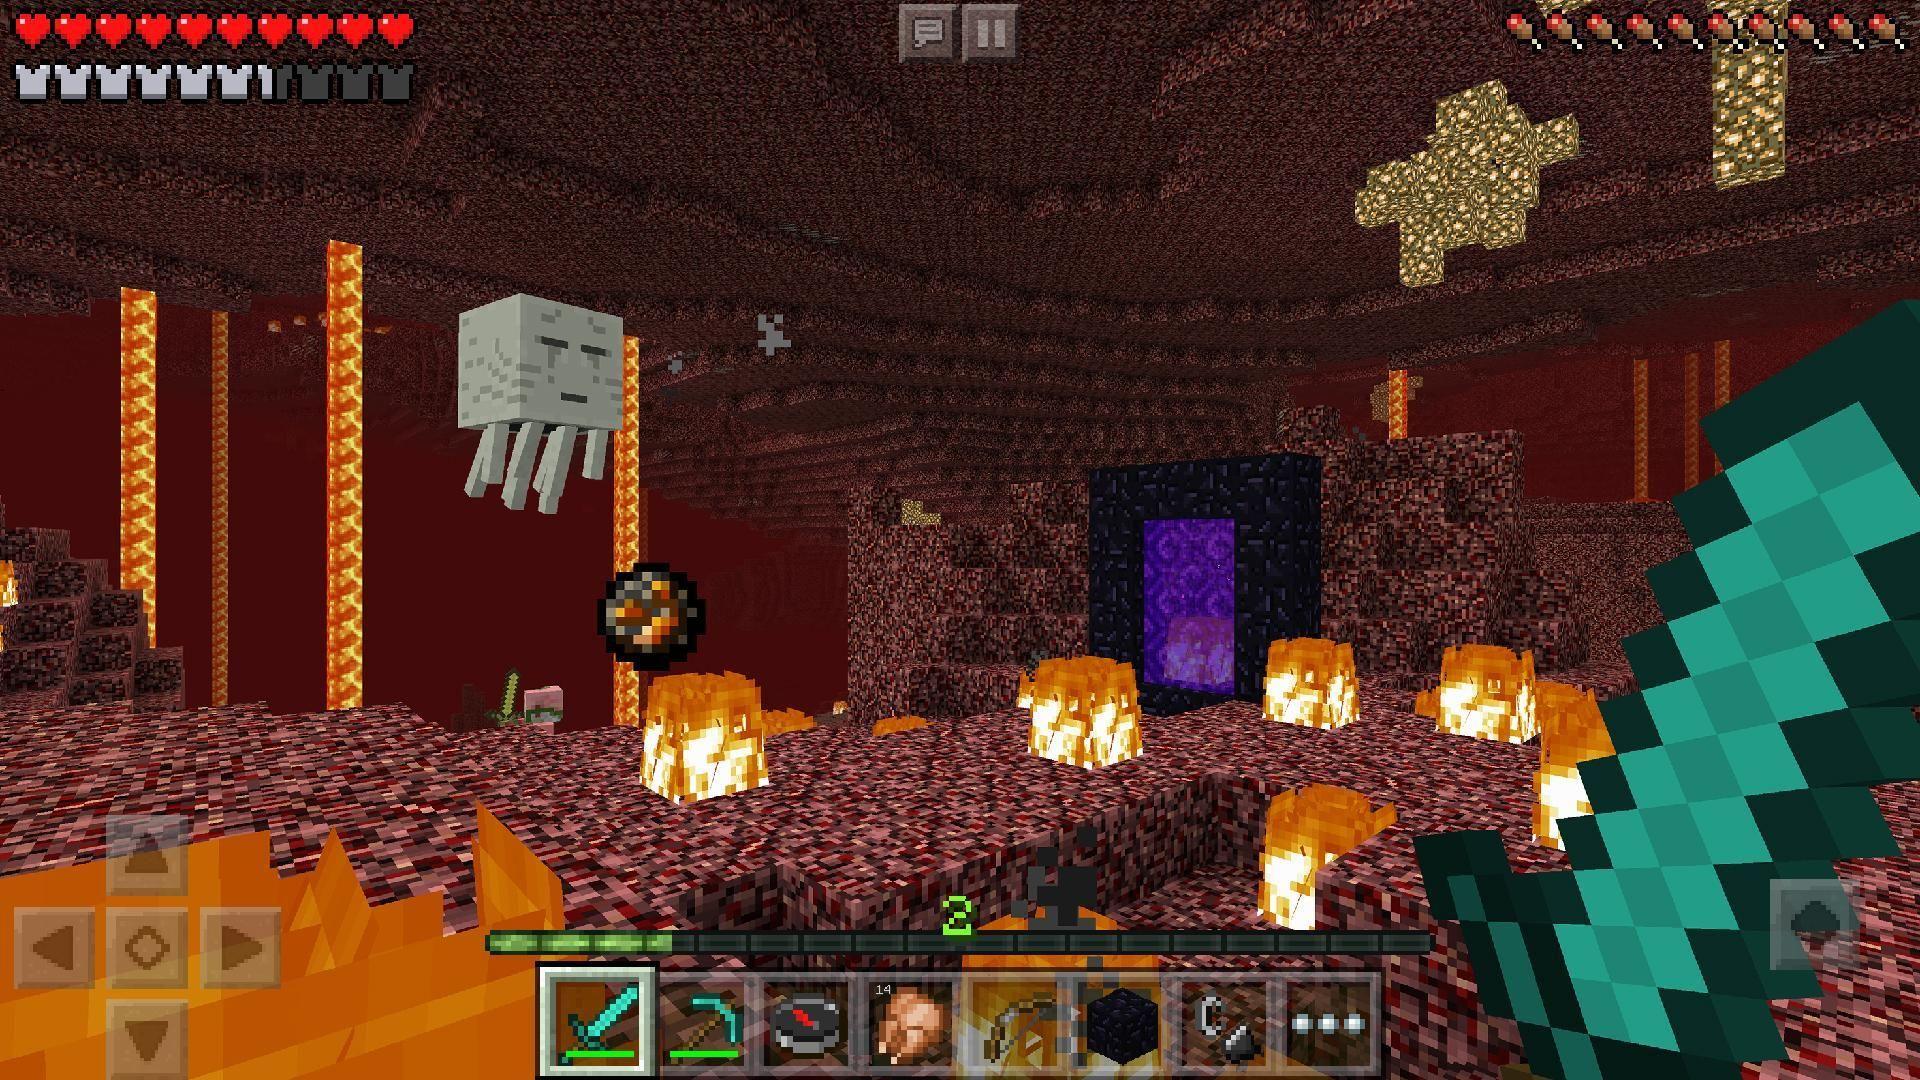 Dowloand Minecraft Mod Apk Techbigs New Version Minecraft App Minecraft Pocket Edition Pocket Edition